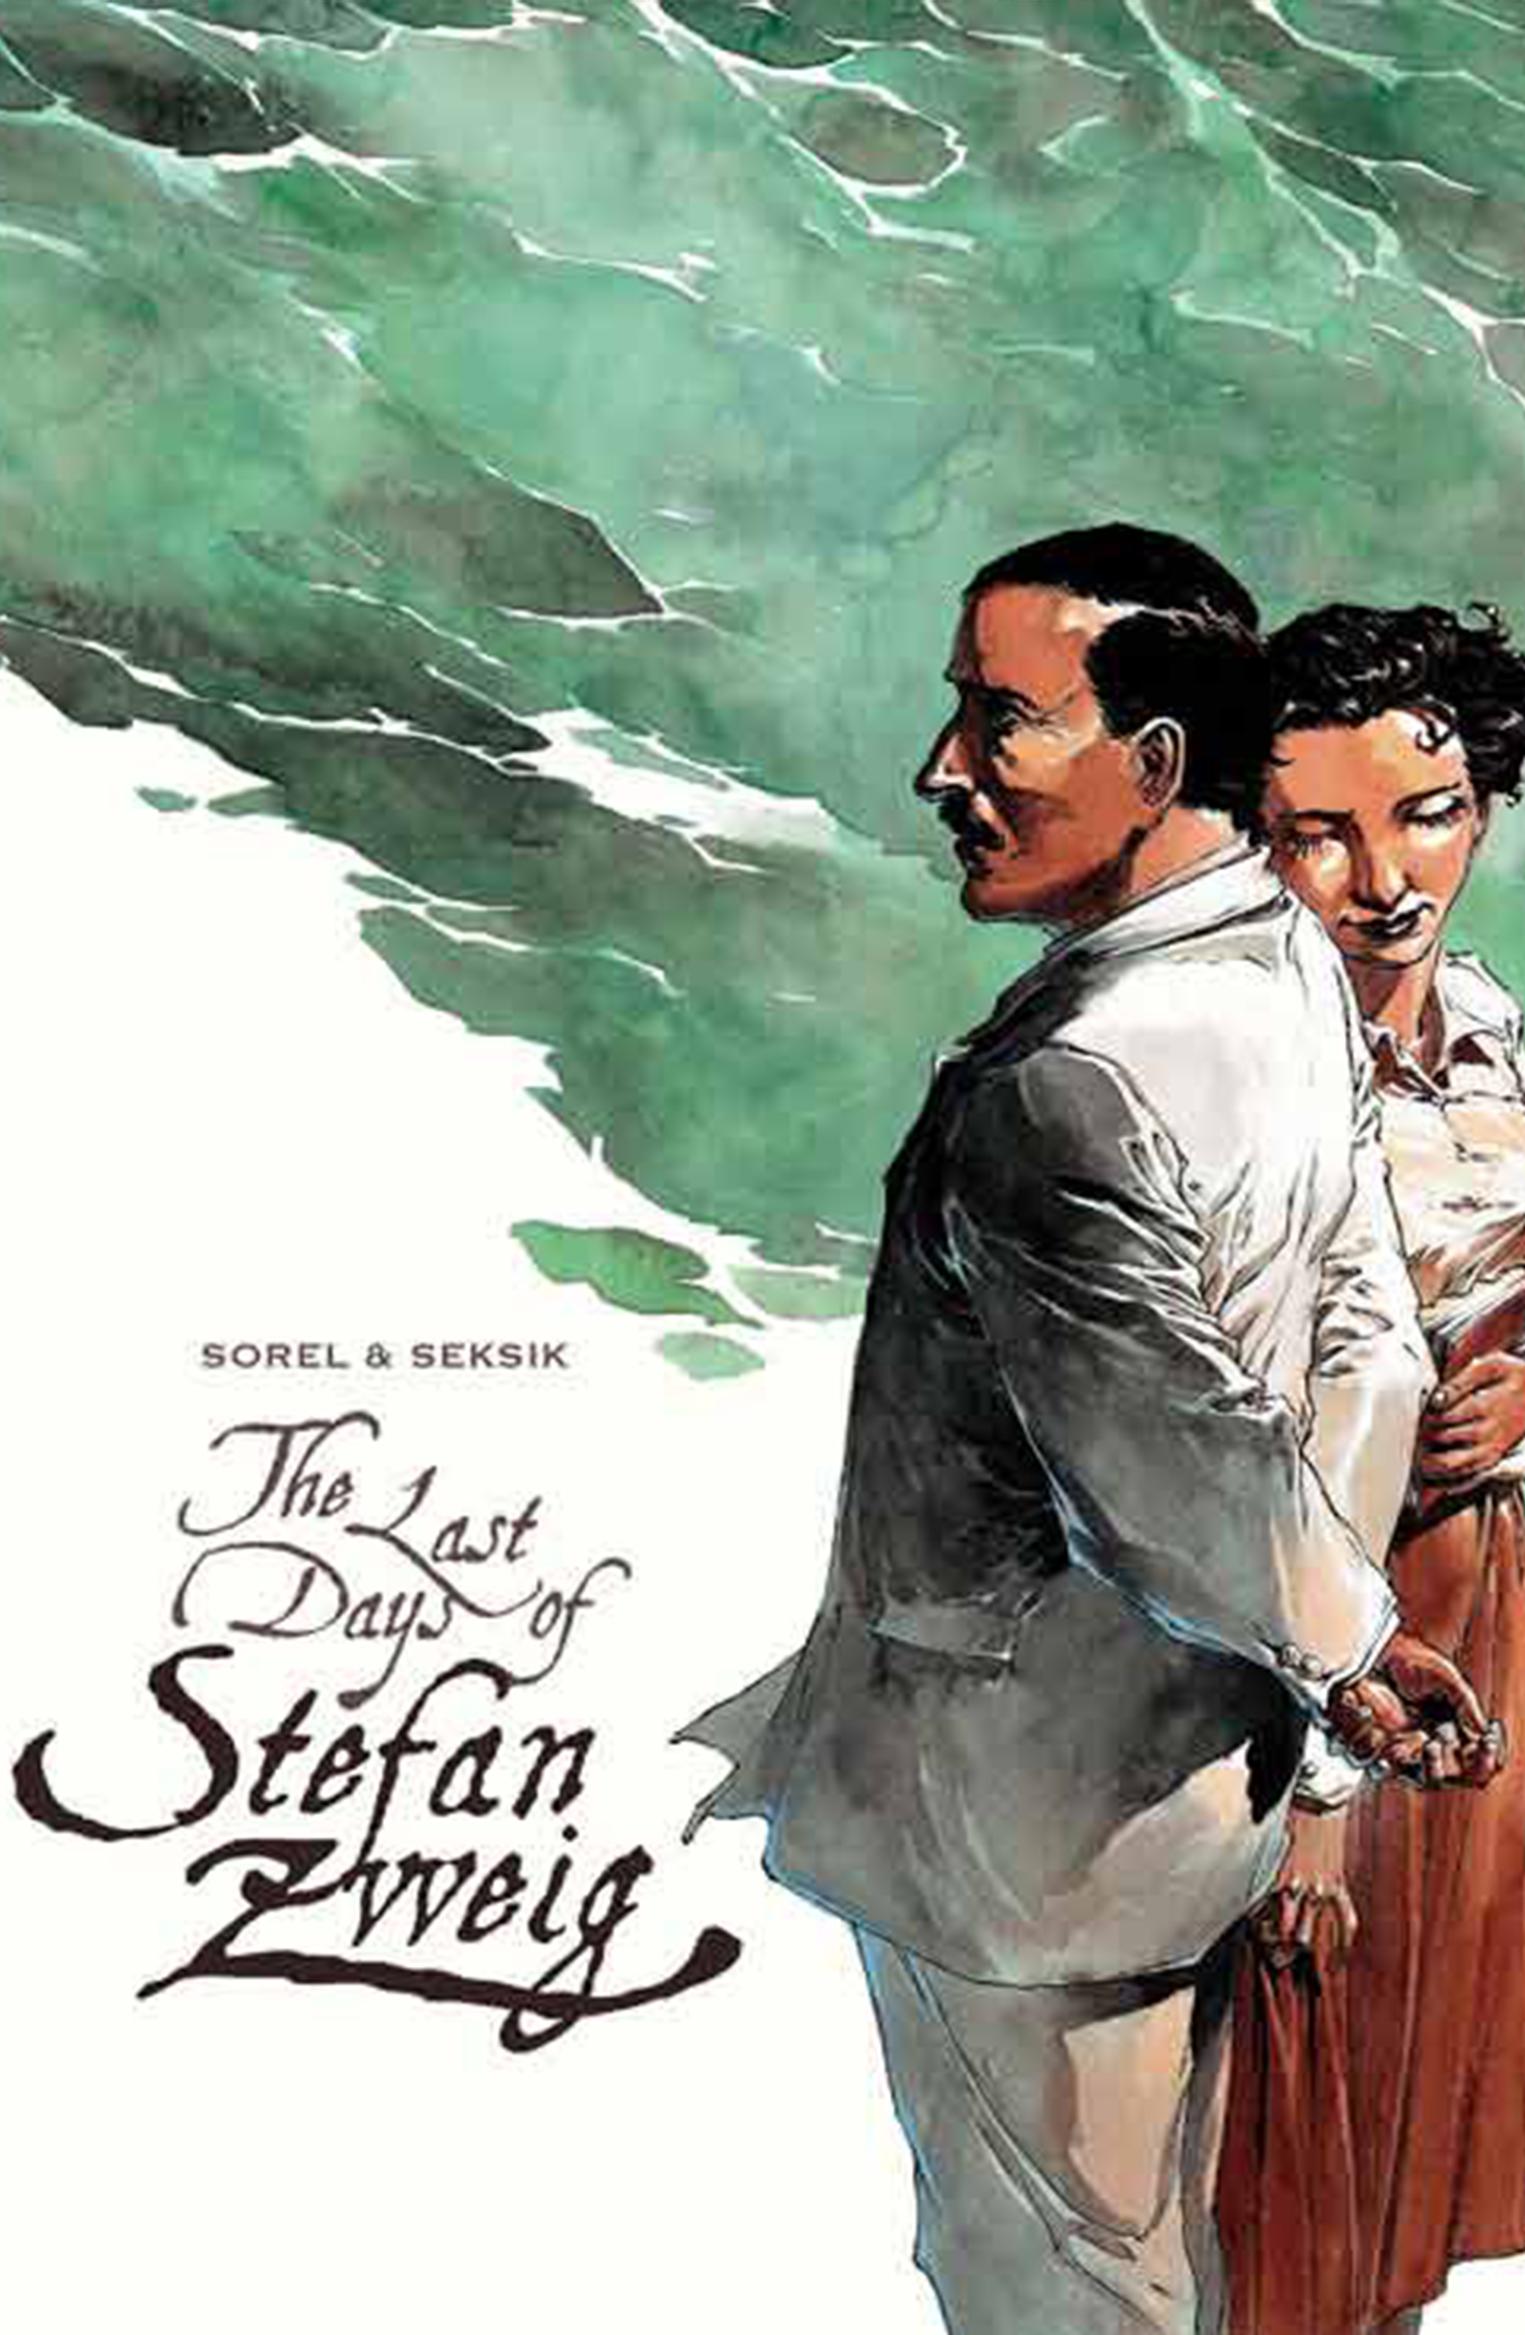 The Last Days of Stefan Zweig - by Laurent Seksik & Guillaume Sorel